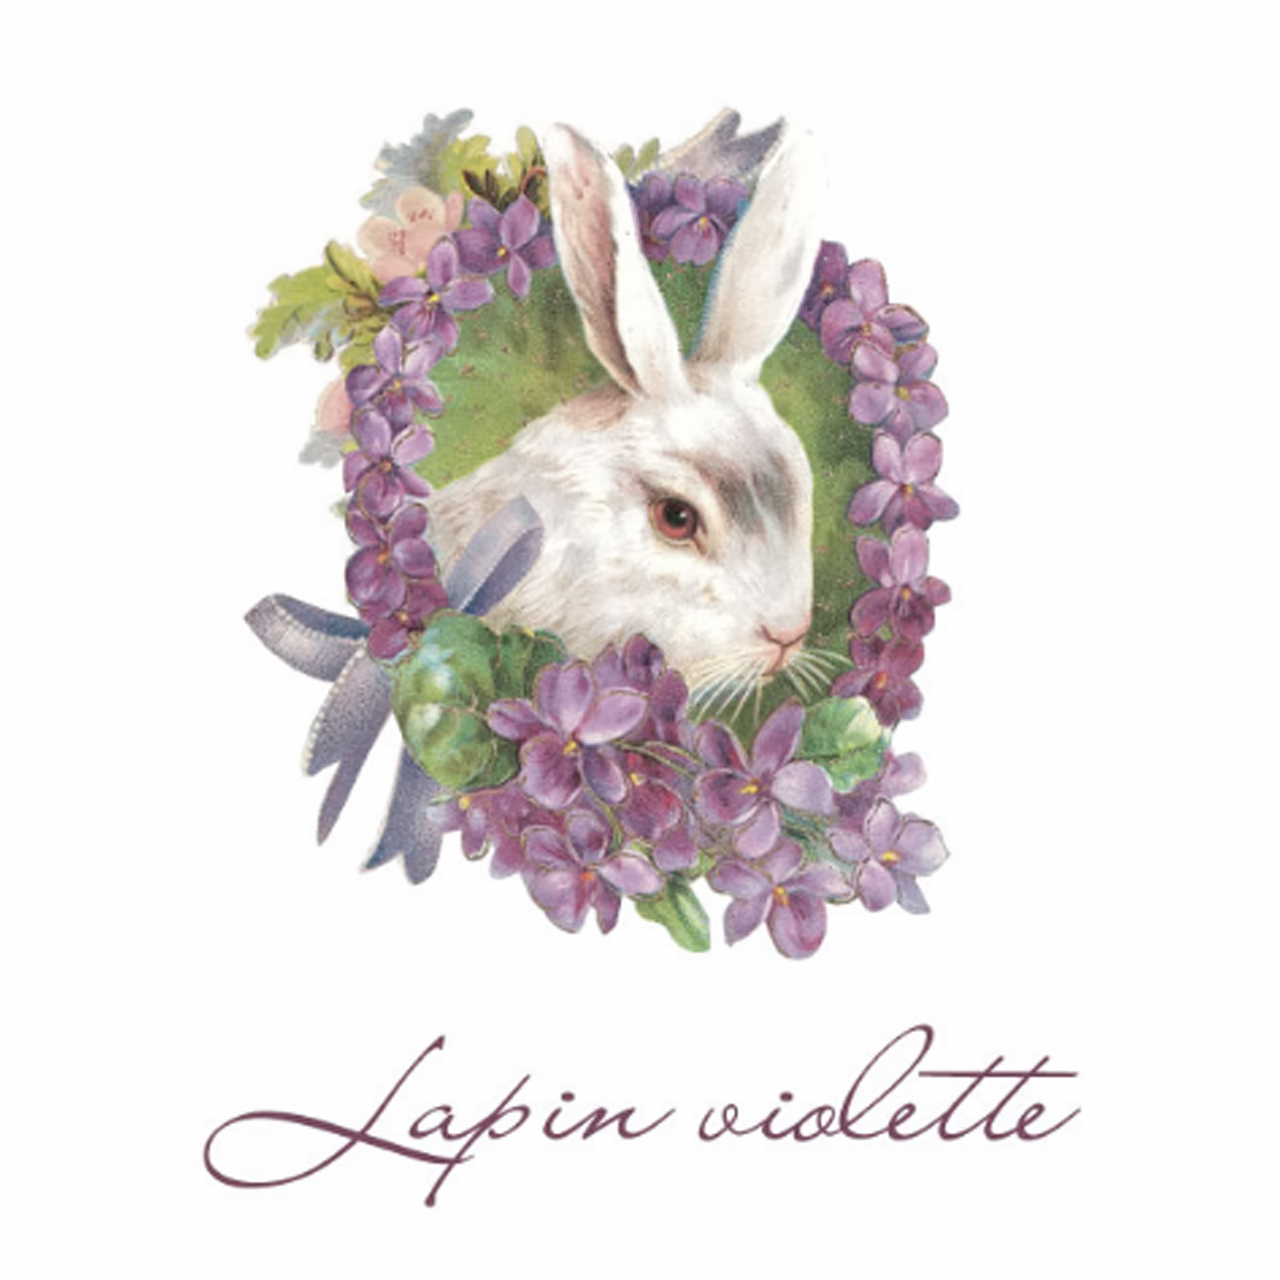 Lapin violette - ラパンヴィオレット